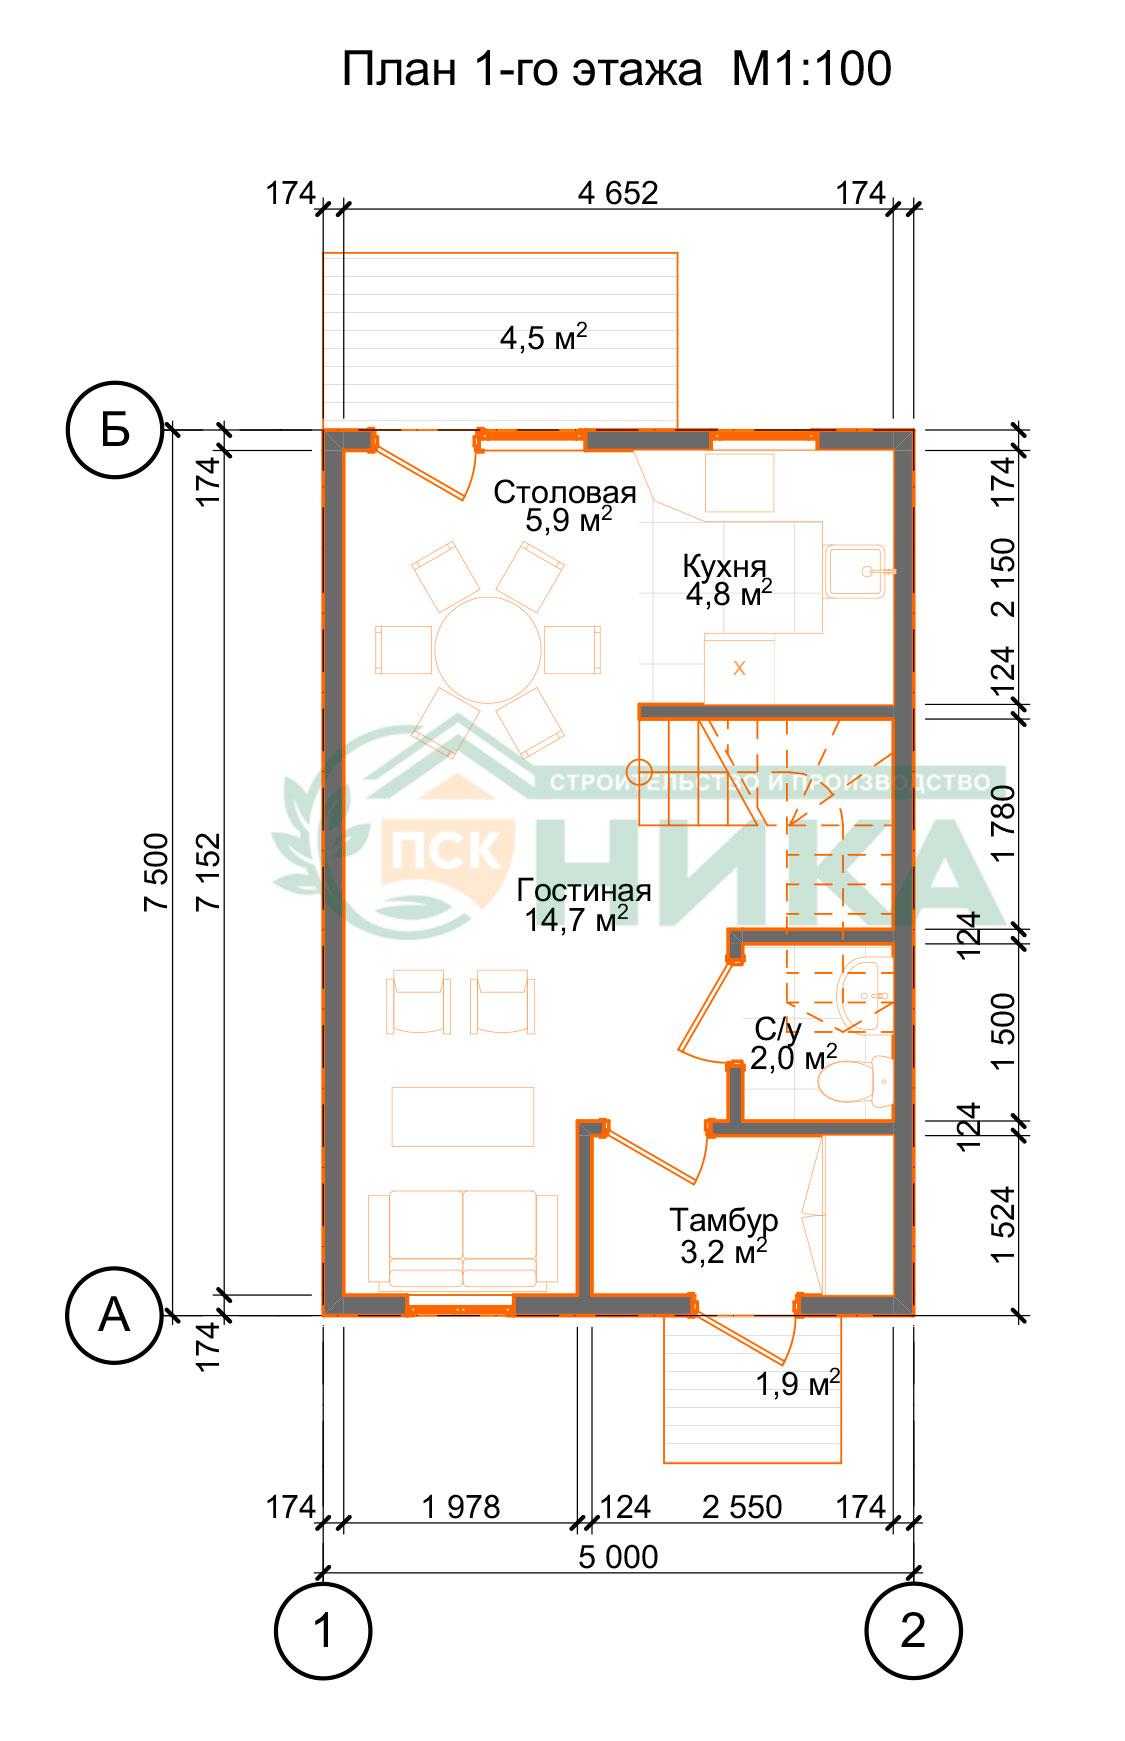 План первого этажа Таунхаус